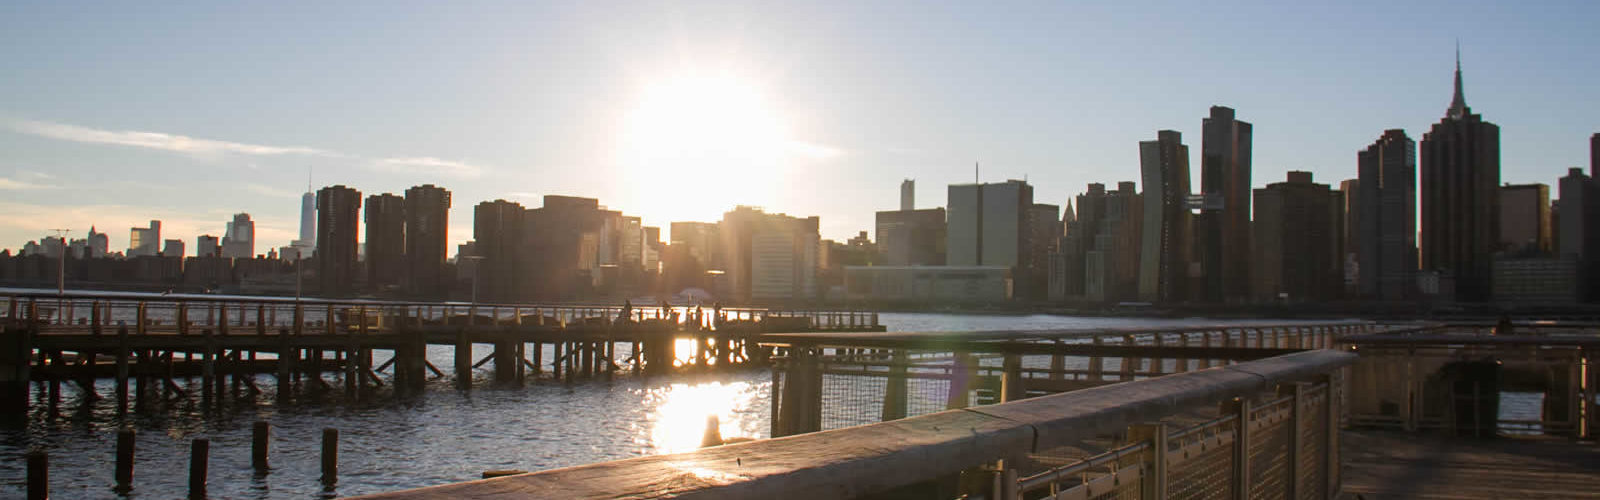 que-faire-long-island-city-quartier-queens-vue-manhattan-une2